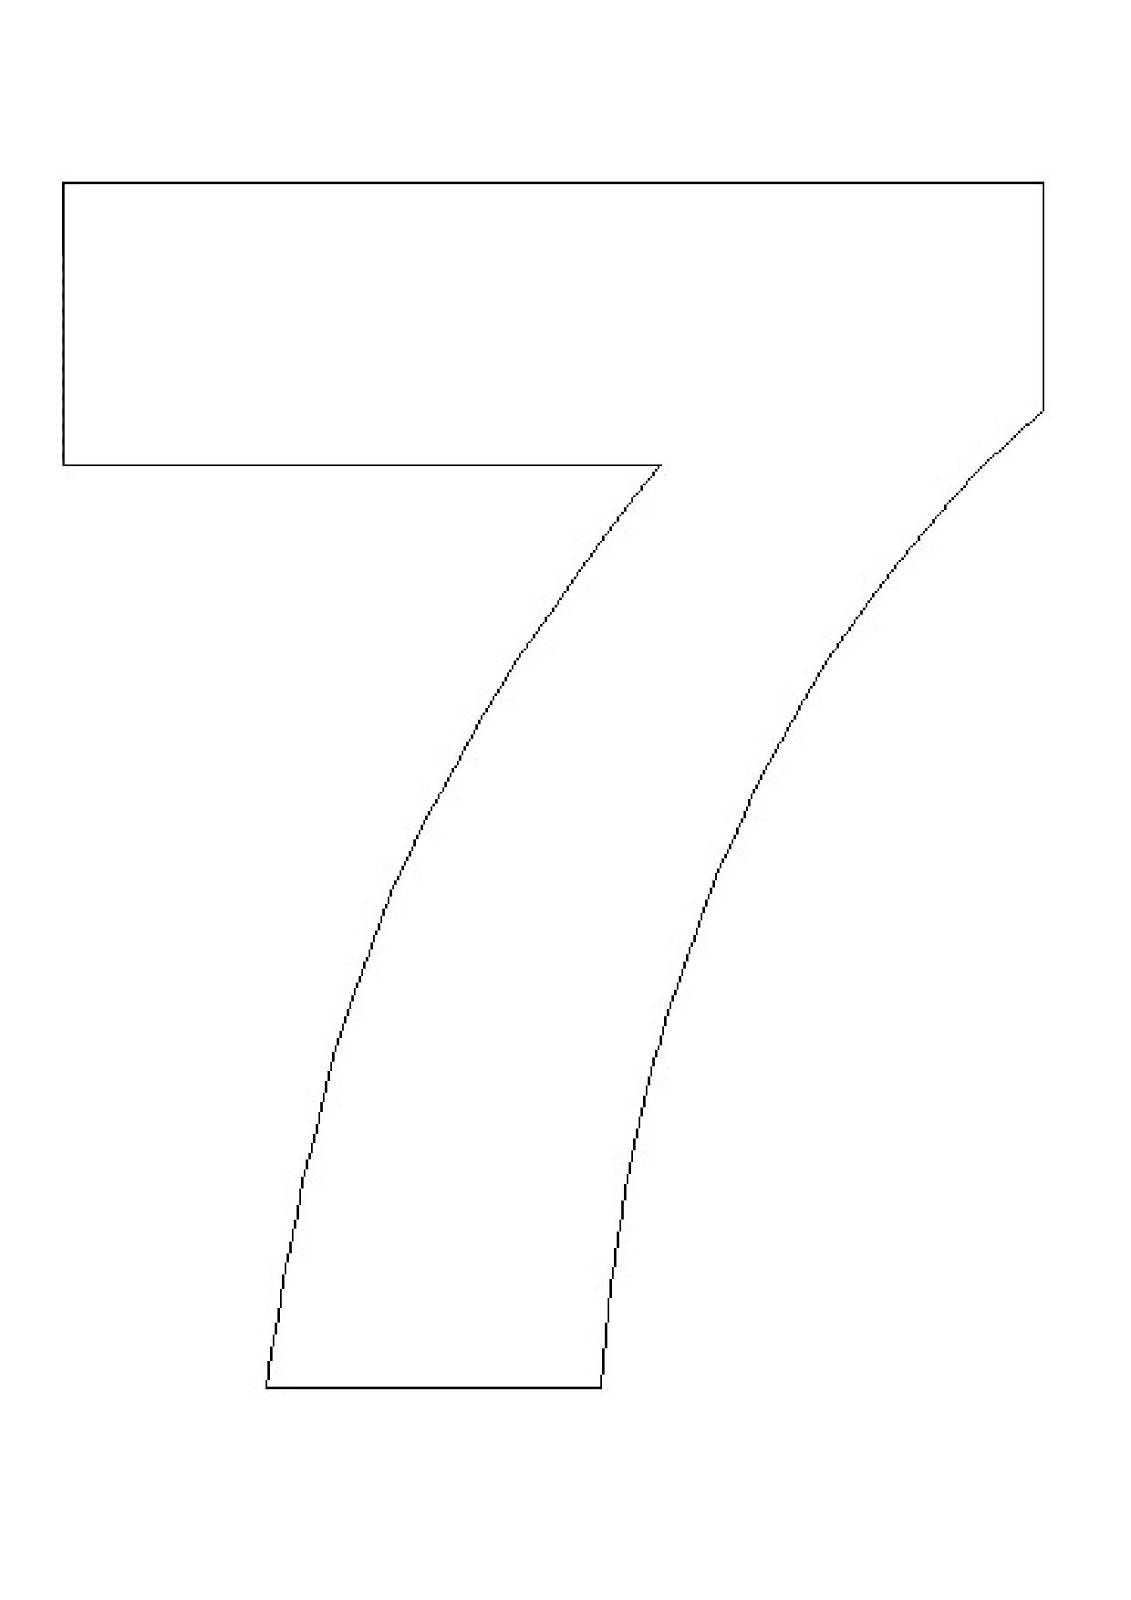 37 Free Download Desenho Do Numeral 8 Para Colorir Worksheets For